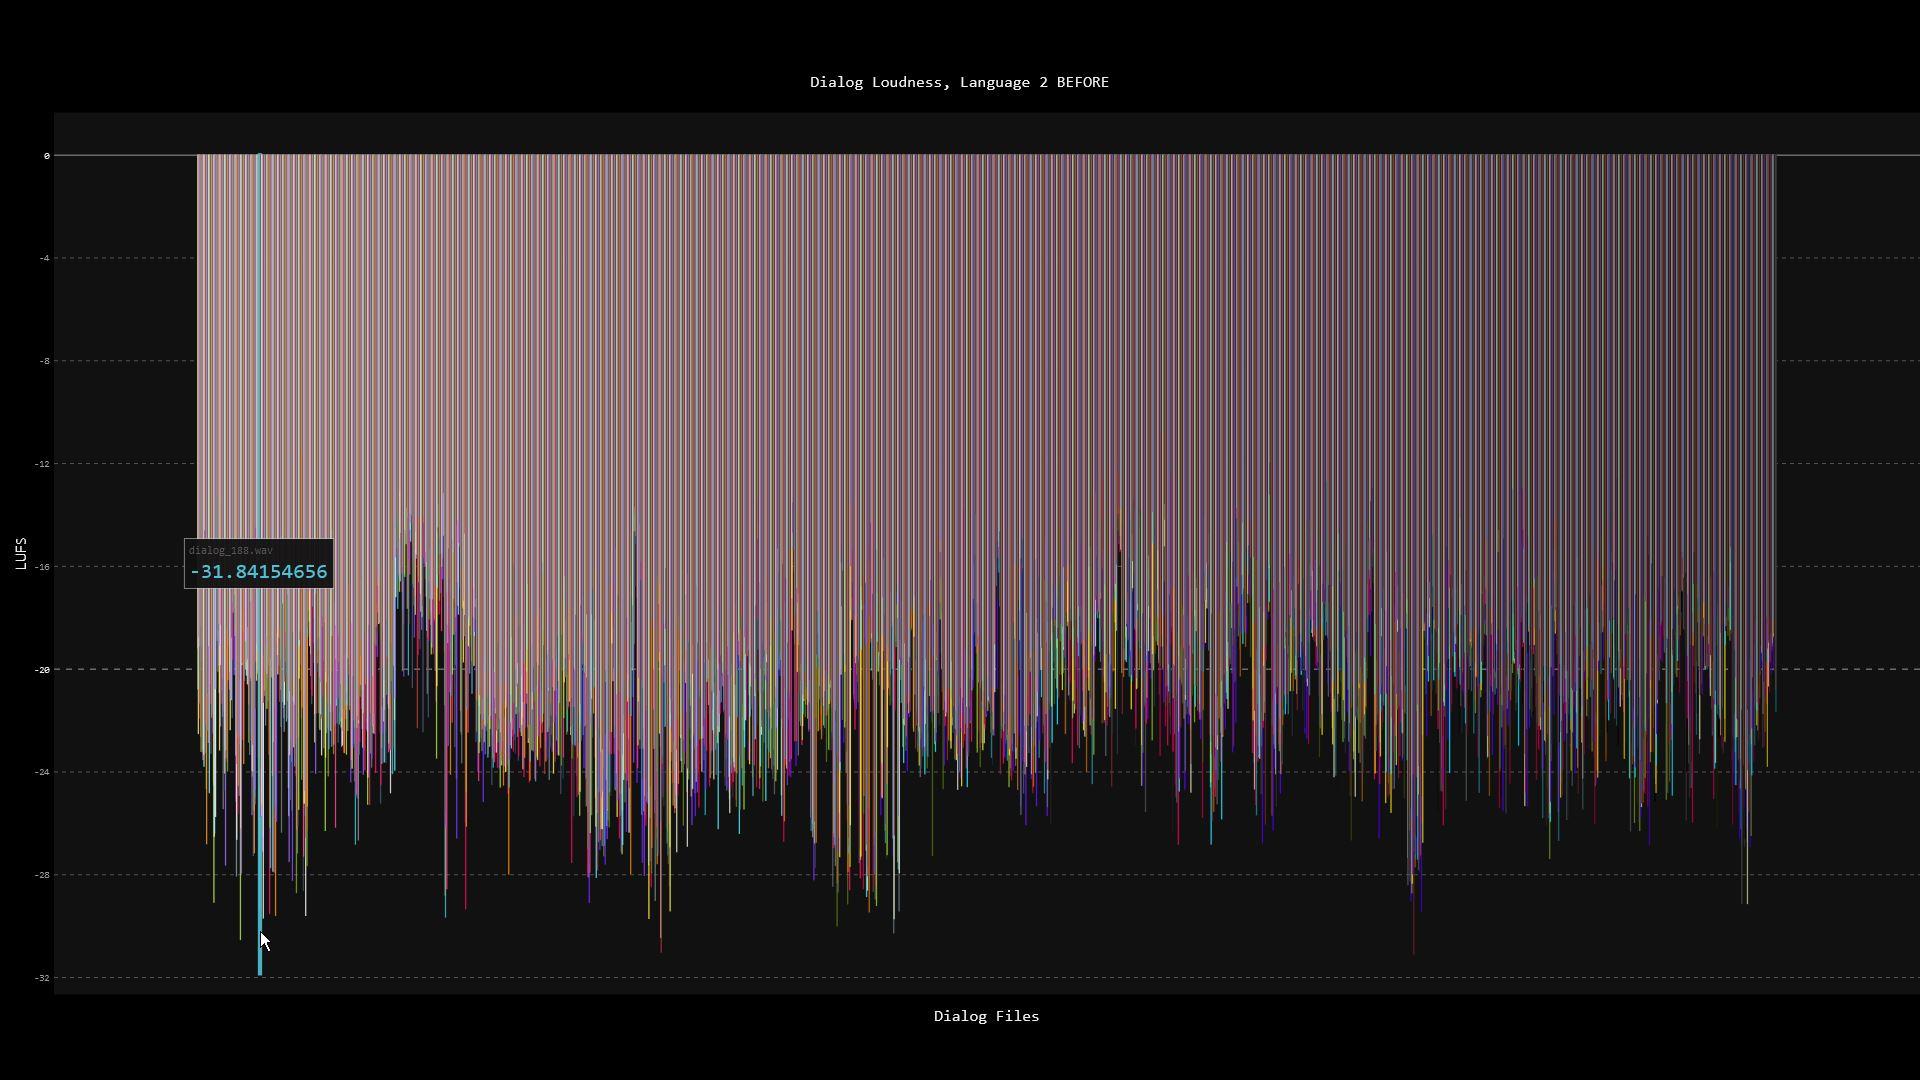 SVG chart of LUFS values per audio file.